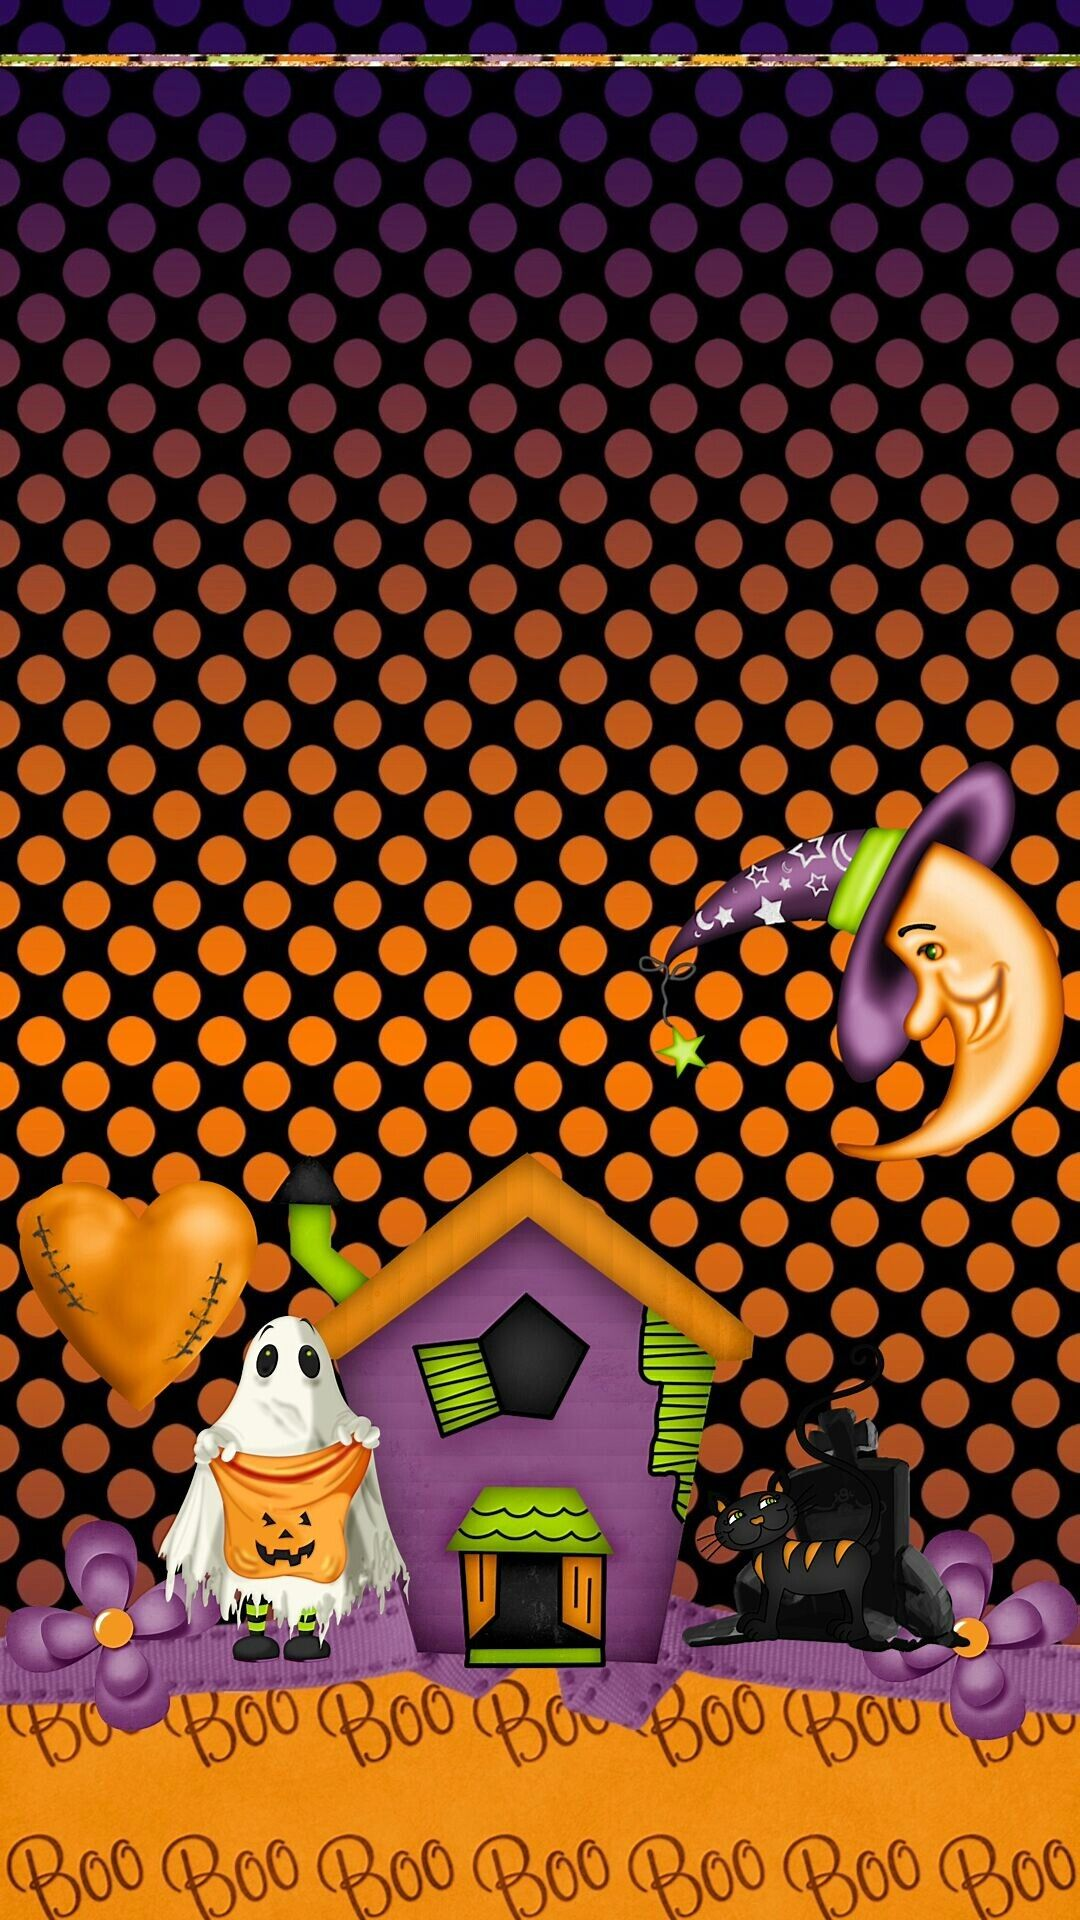 Download Wallpaper Halloween Pinterest - 8d672a7dfa46eb879f8a18906d65ef91  Gallery_585819.jpg